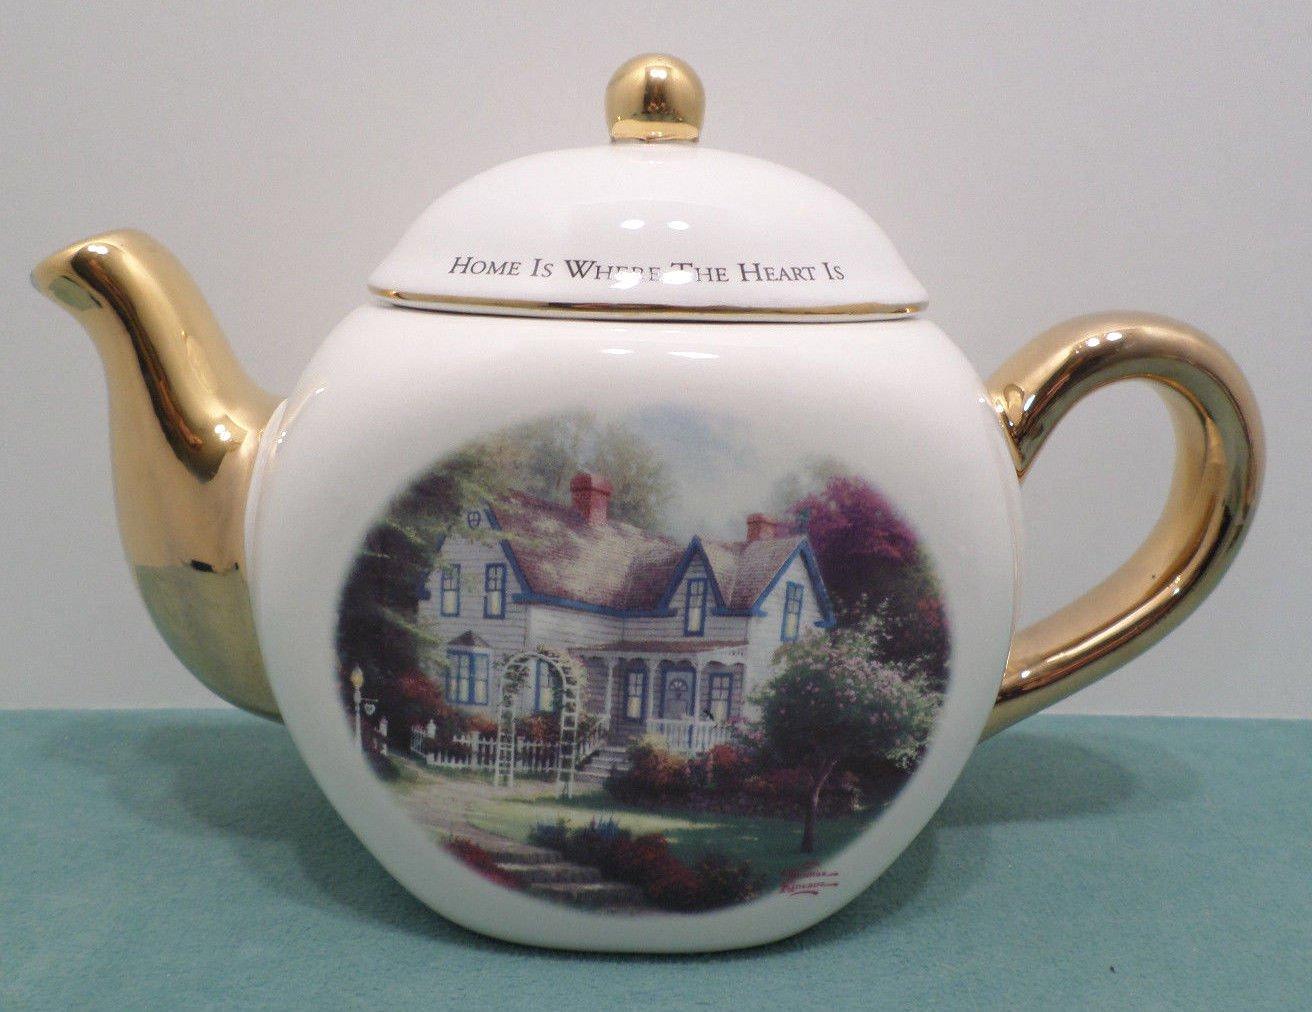 Tea Pot Home is Where the Heart is by Thomas Kinkade Teleflora Porcelain